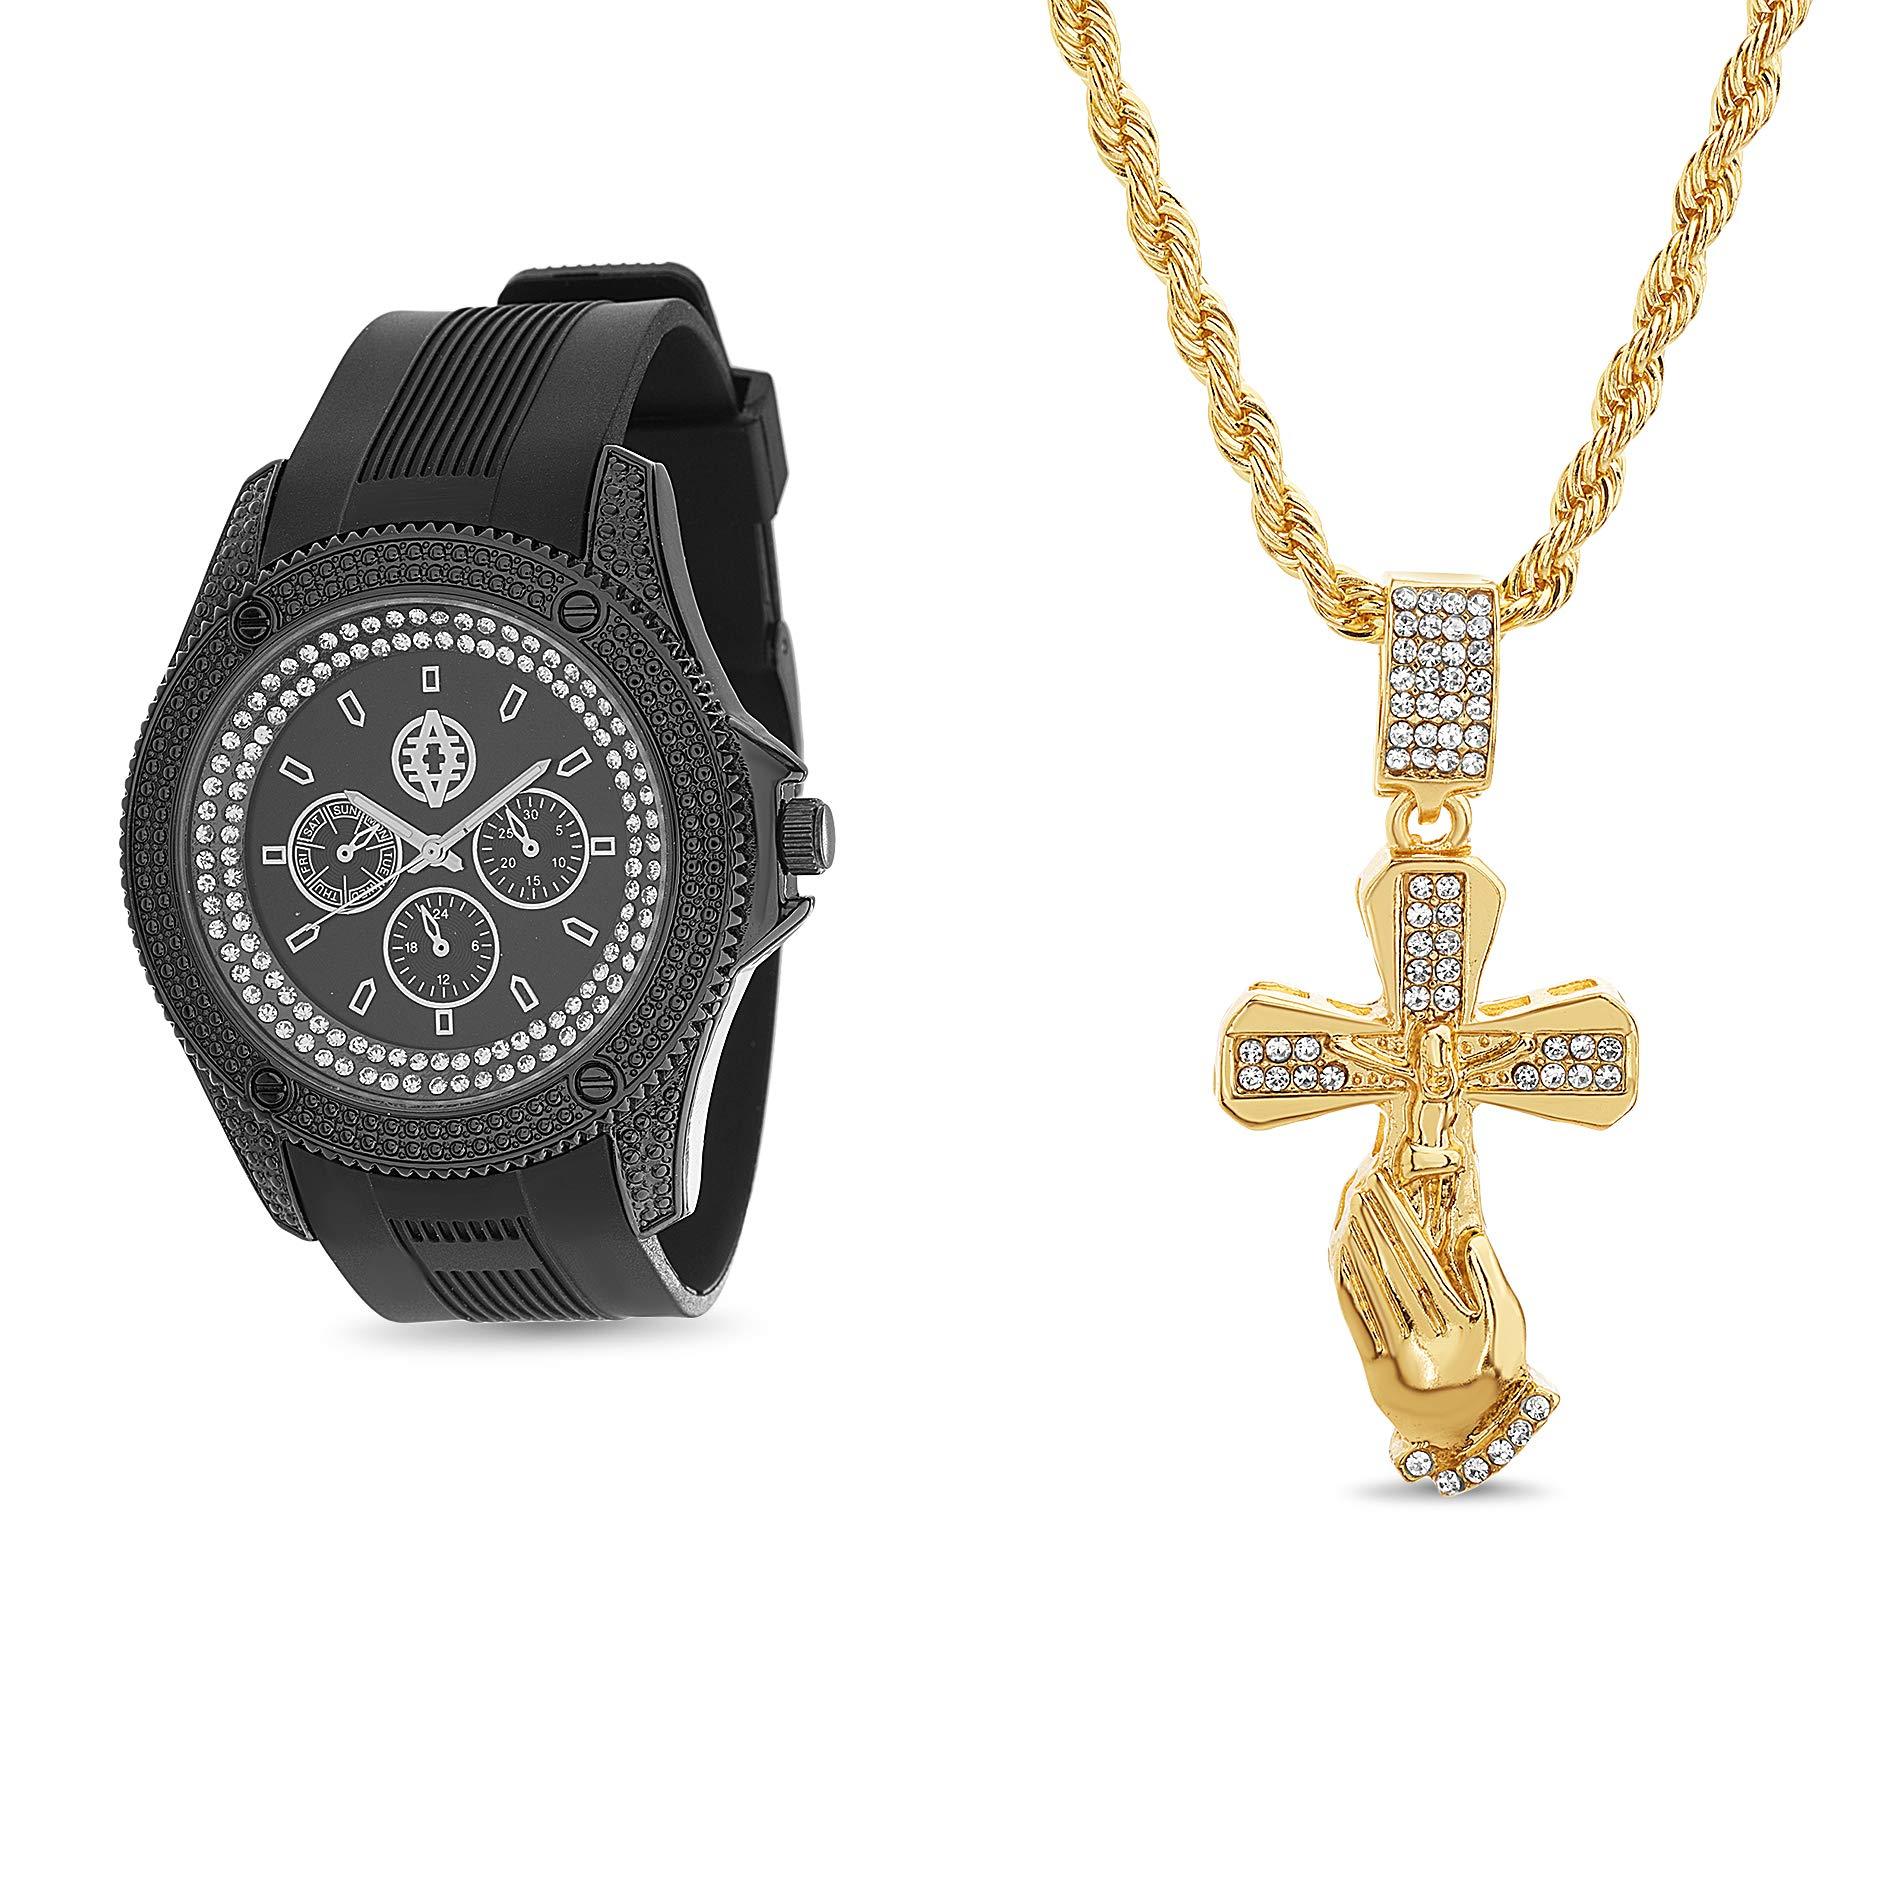 Akademiks 橡胶表带水钻祈祷手镯项链男式手表套装